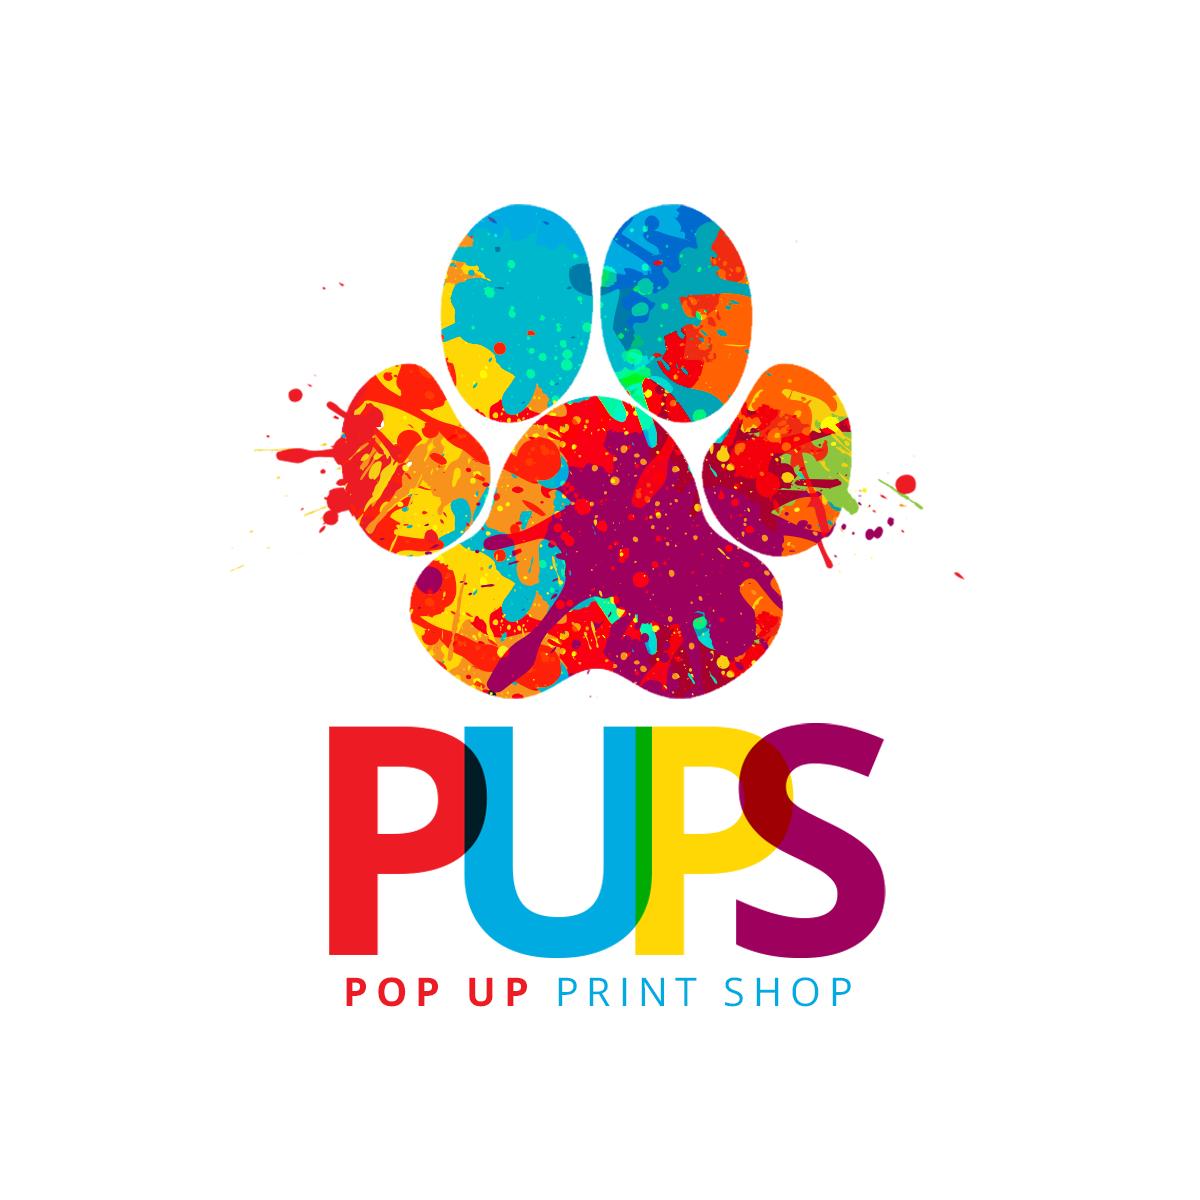 Pop Up Print Shop logo